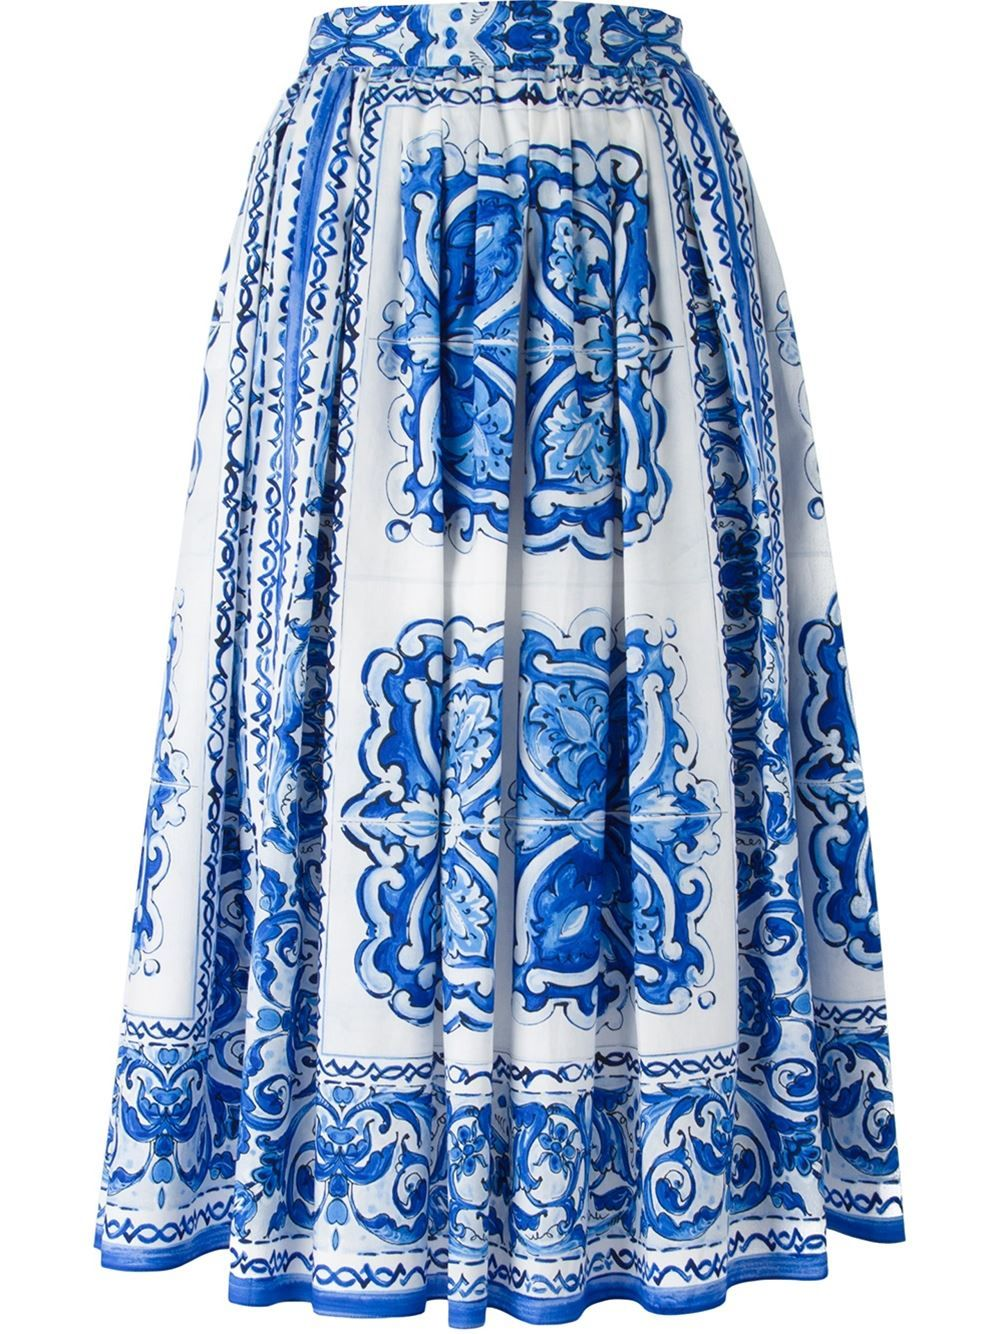 Dolce & Gabbana 'majolica' Rock In A-linie - Donne Concept Store - Farfetch.com